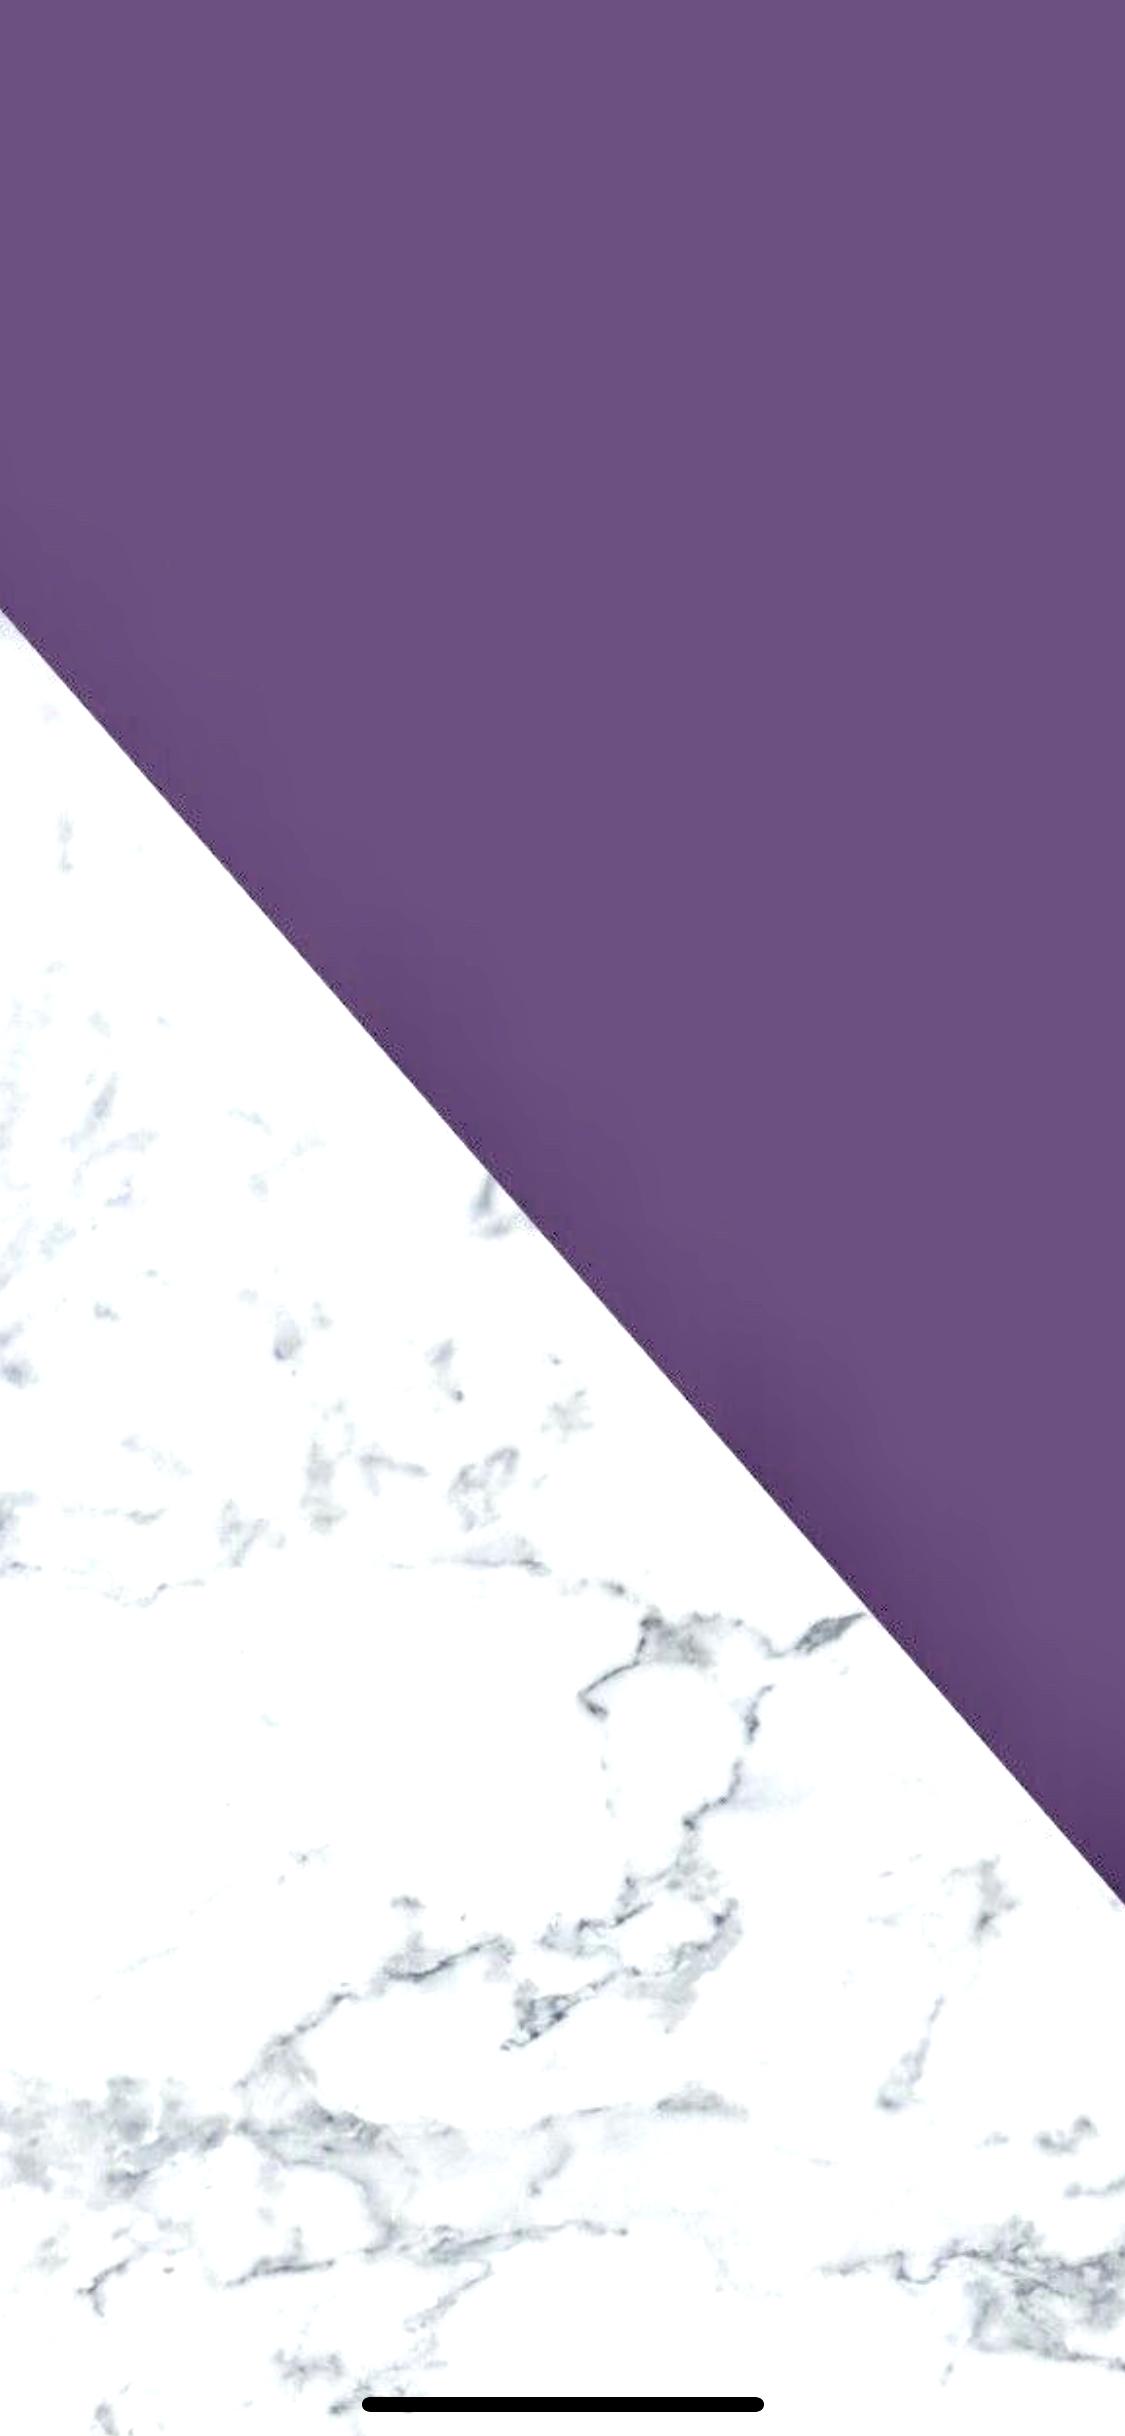 Iphone Purple Marble Wallpaper